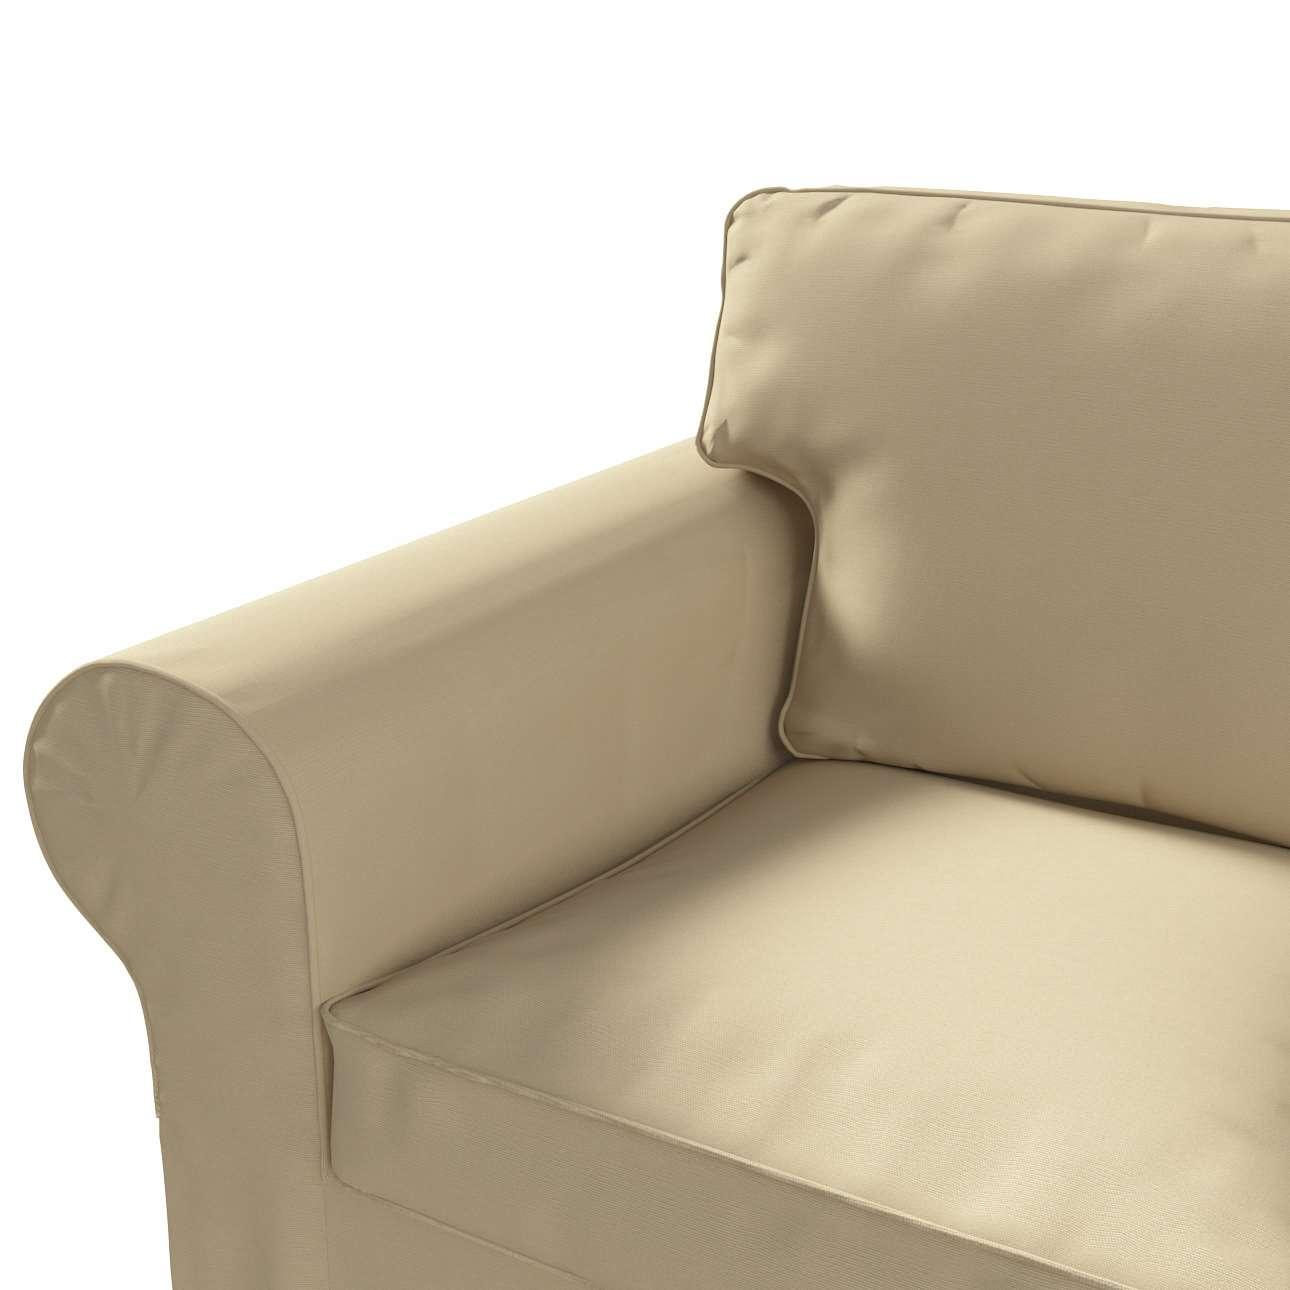 Ektorp 3-Sitzer Sofabezug nicht ausklappbar Sofabezug für  Ektorp 3-Sitzer nicht ausklappbar von der Kollektion Cotton Panama, Stoff: 702-01